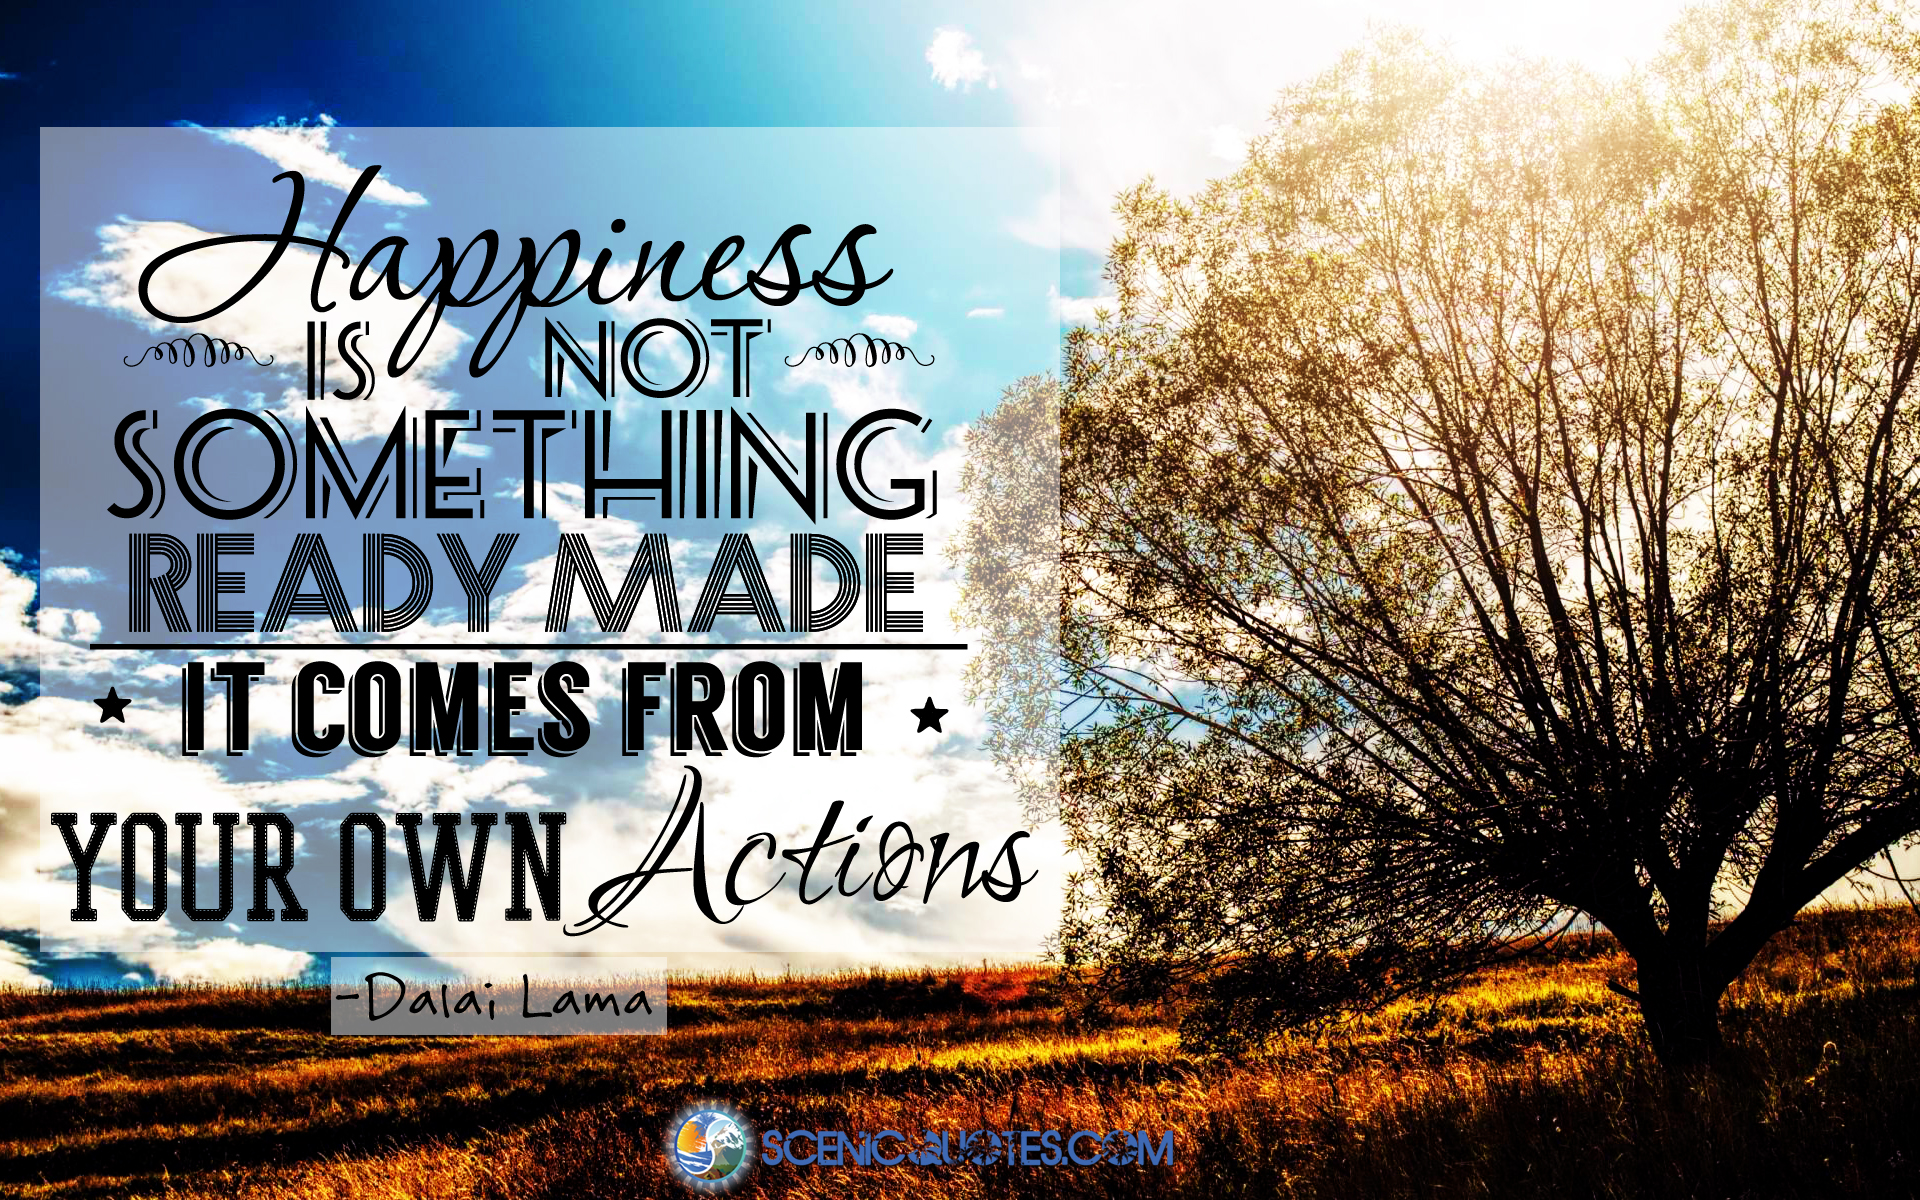 Happiness quotes bu scenicquotes.com